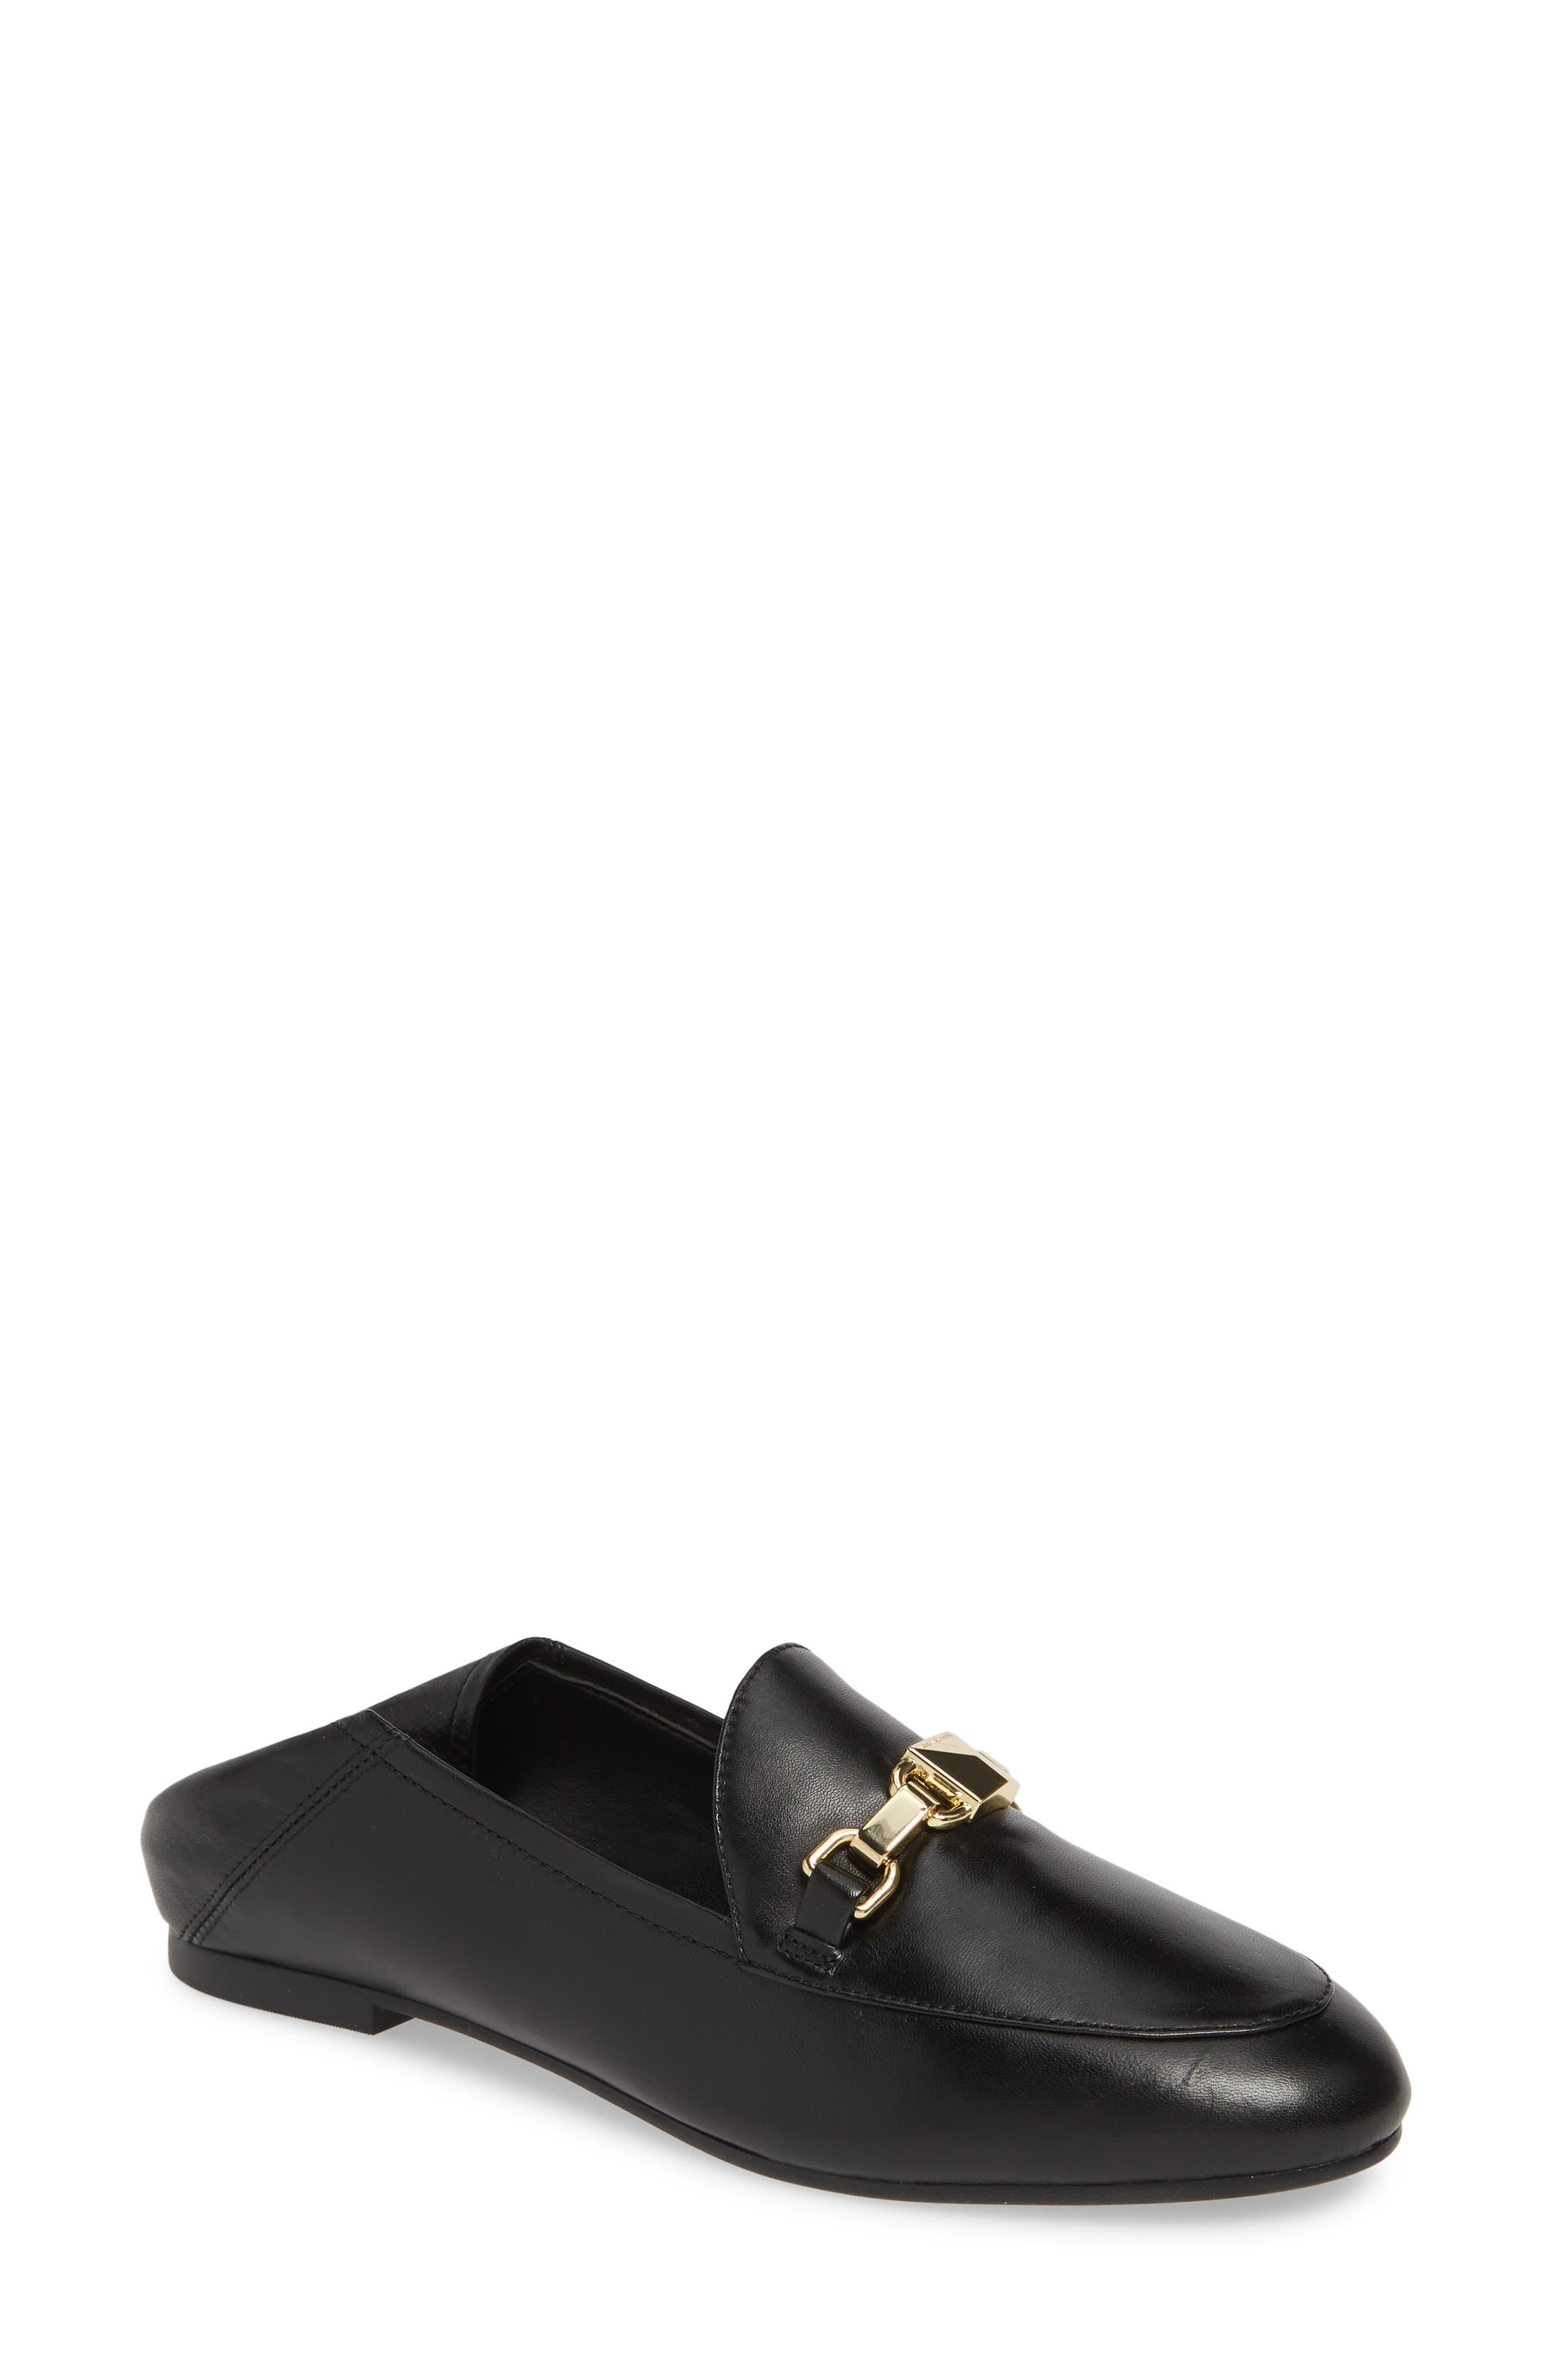 MICHAEL MICHAEL KORS Charlton Convertible Loafer, Main, color, BLACK NAPPA LEATHER